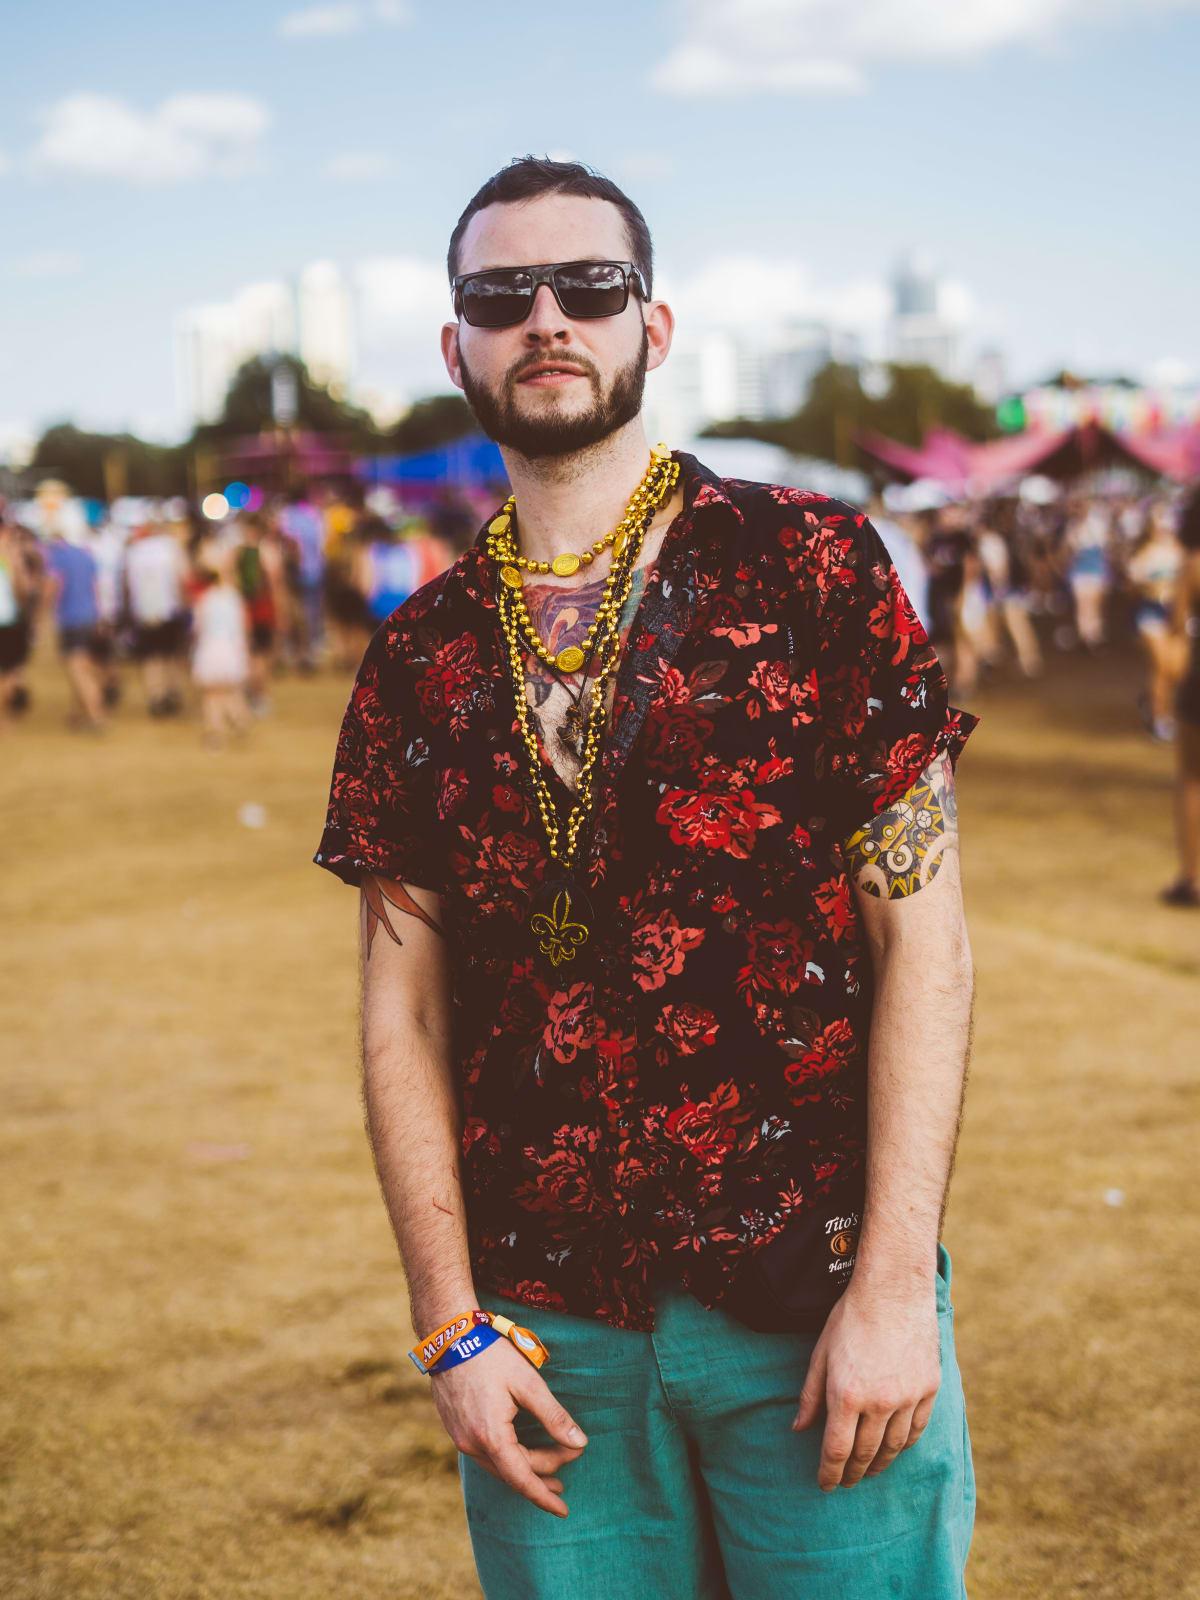 ACL Festival 2018 fashions